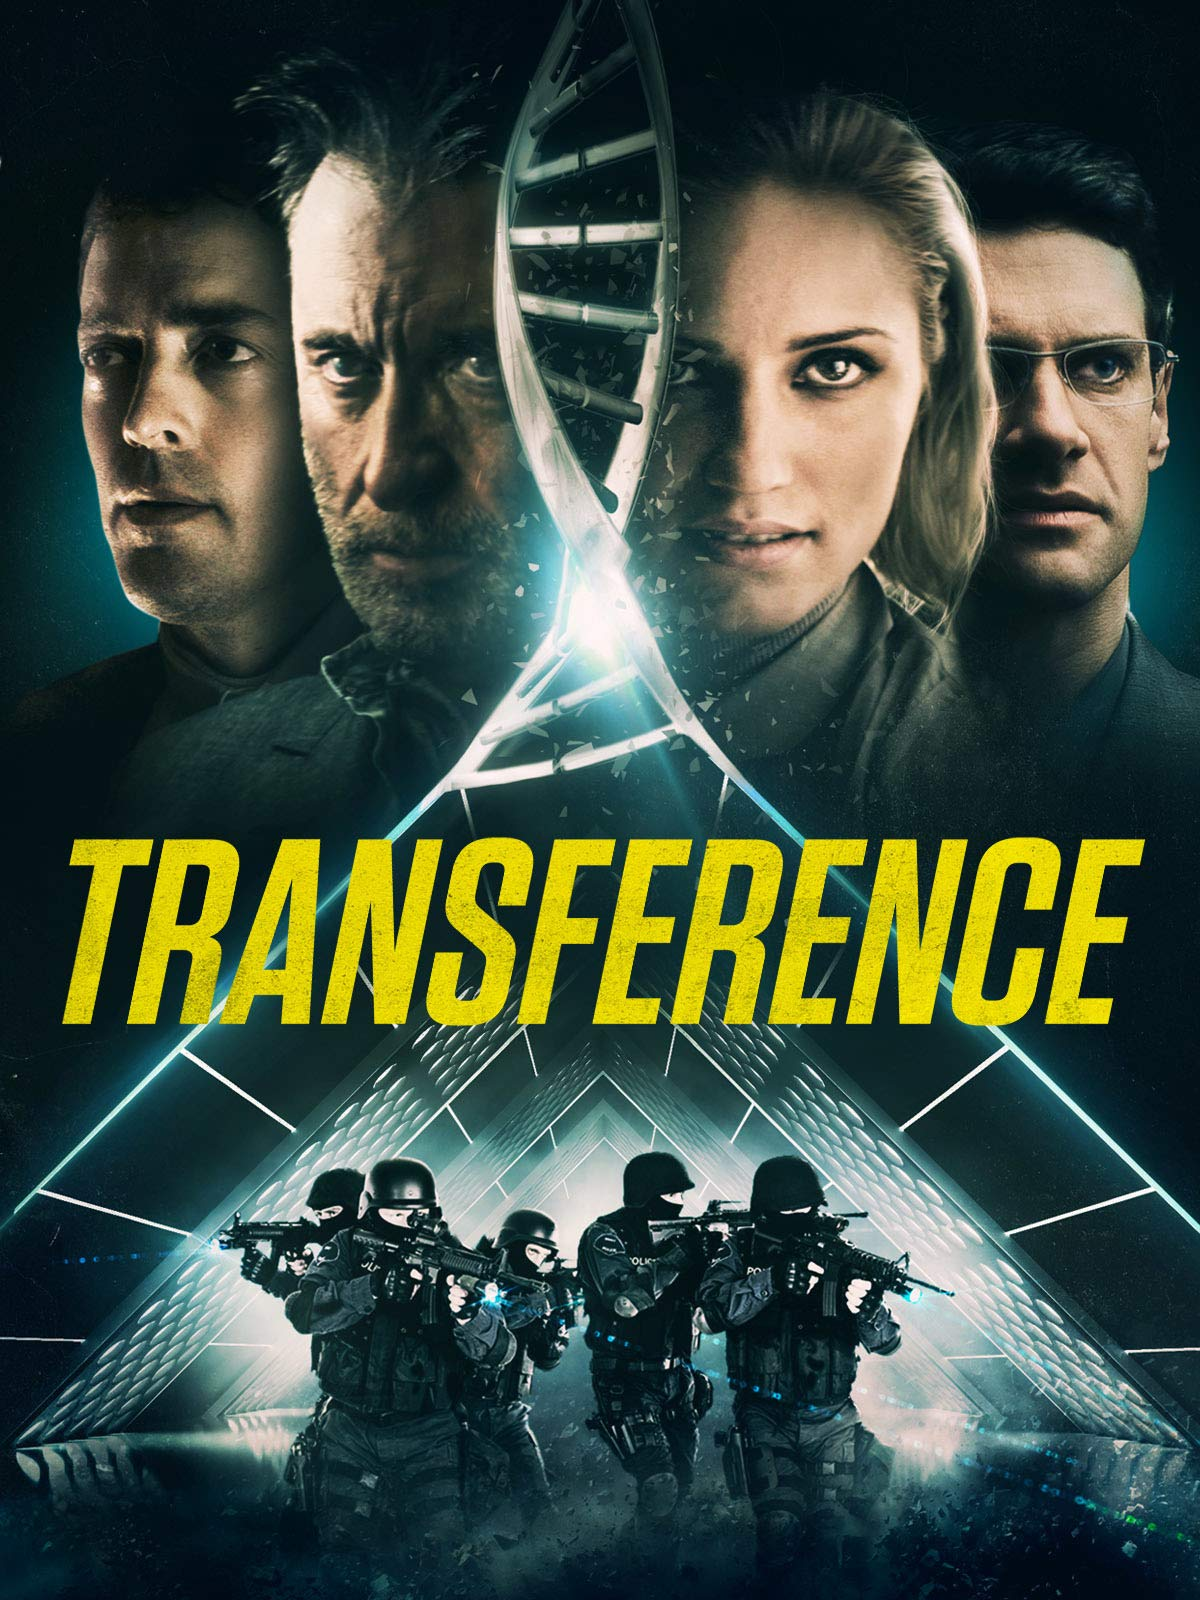 فيلم Transference 2020 مترجم